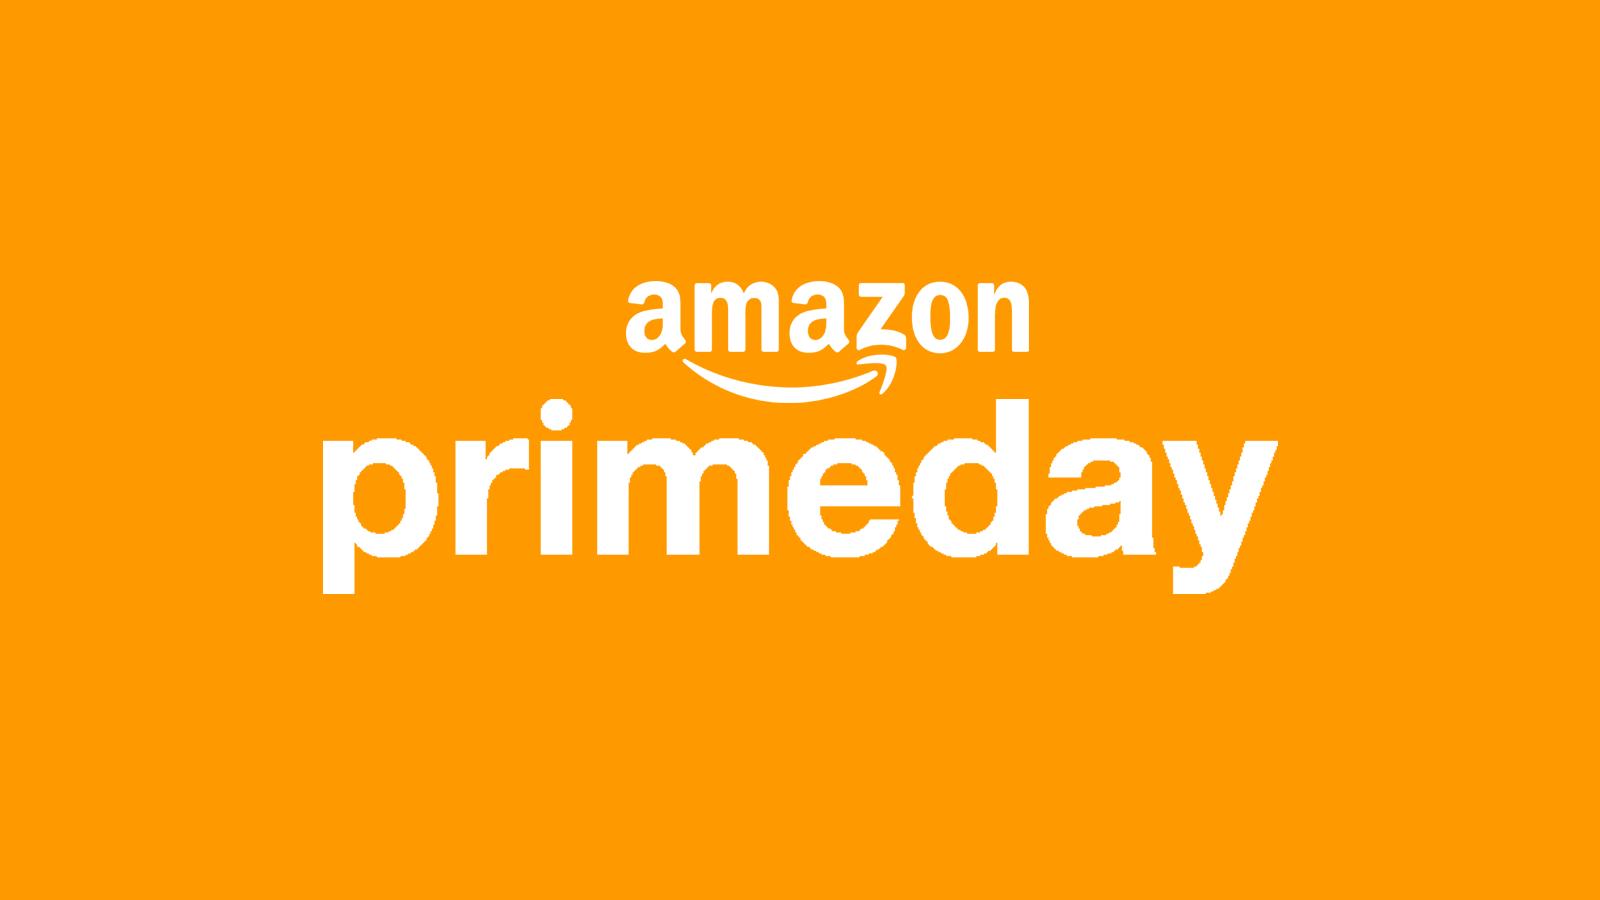 Amazon Prime Day 2019 Deals.